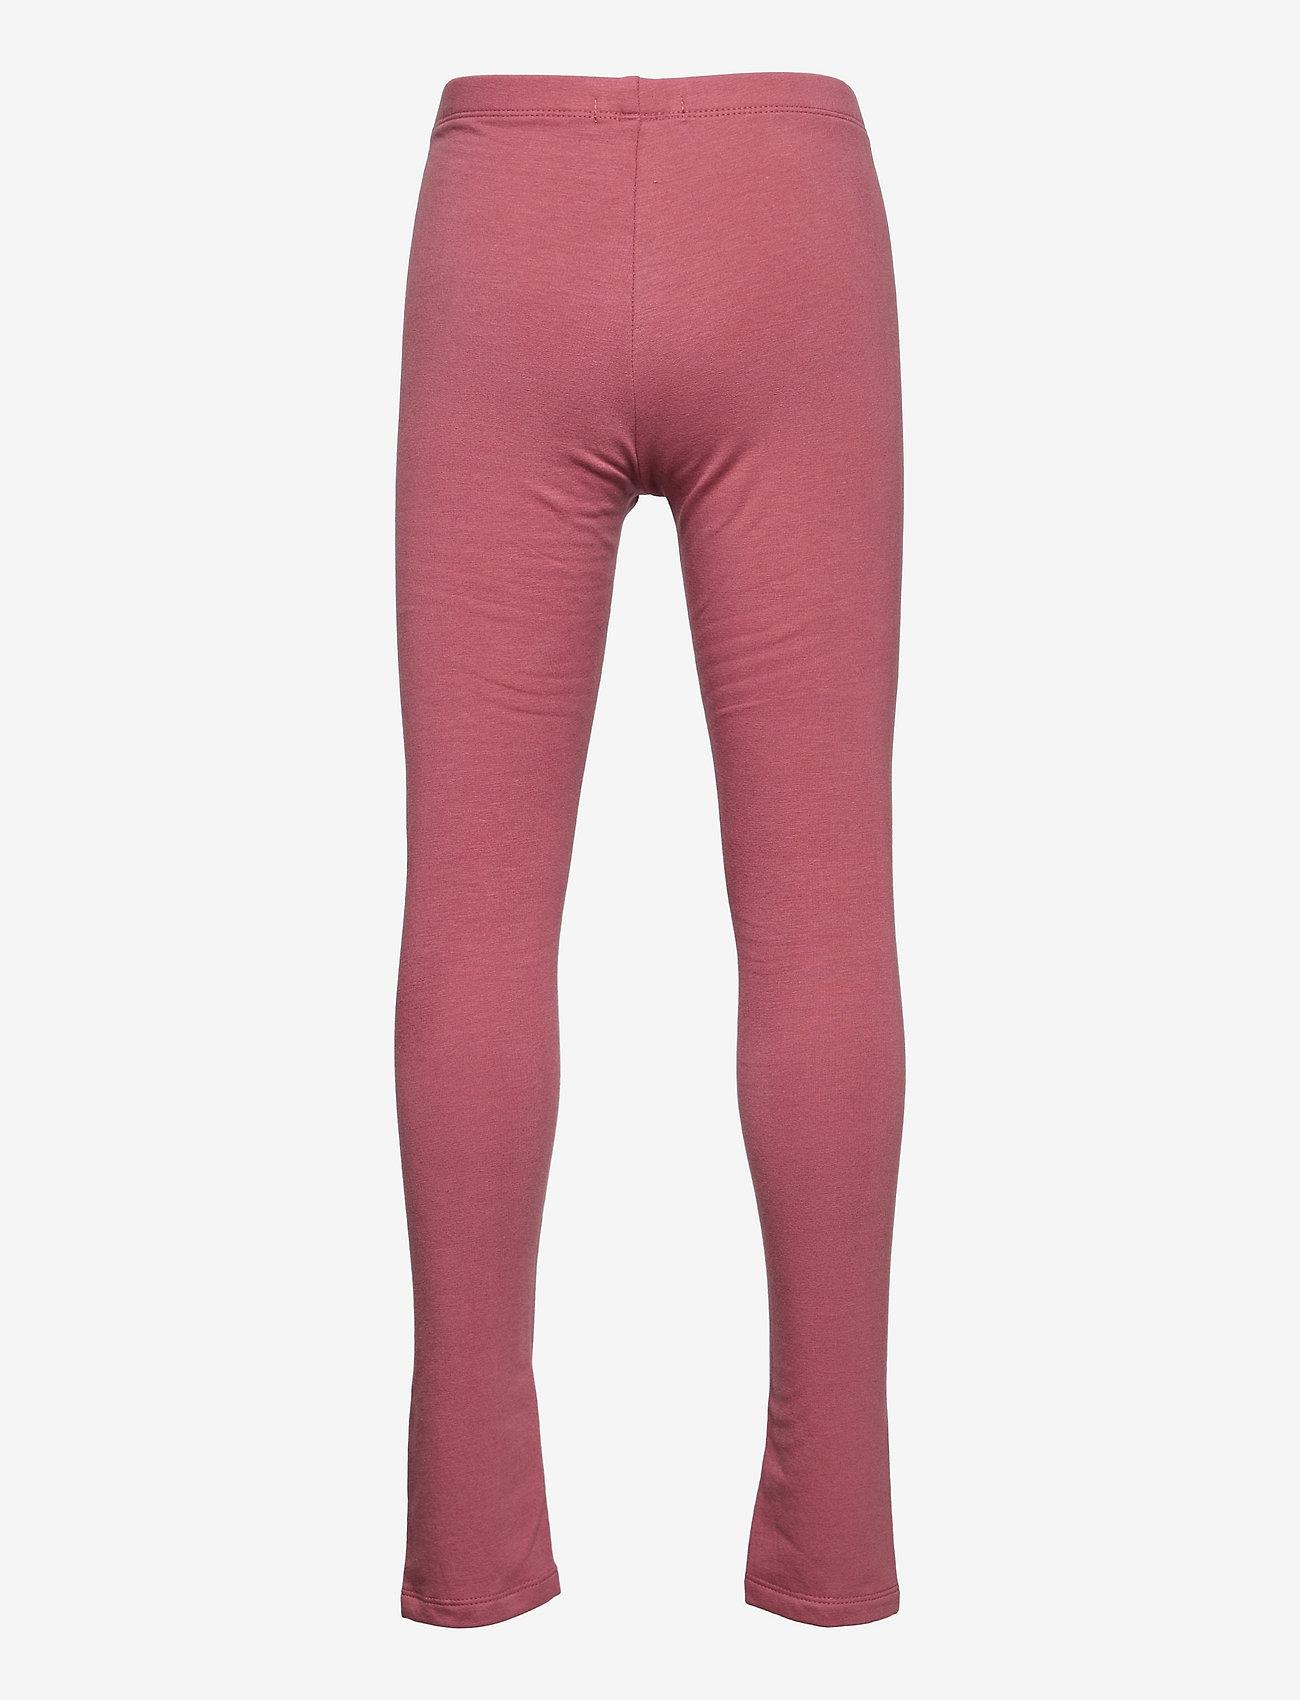 name it - NKFDAVINA SOLID SWE LEGGING  BRU N - leggings - deco rose - 1